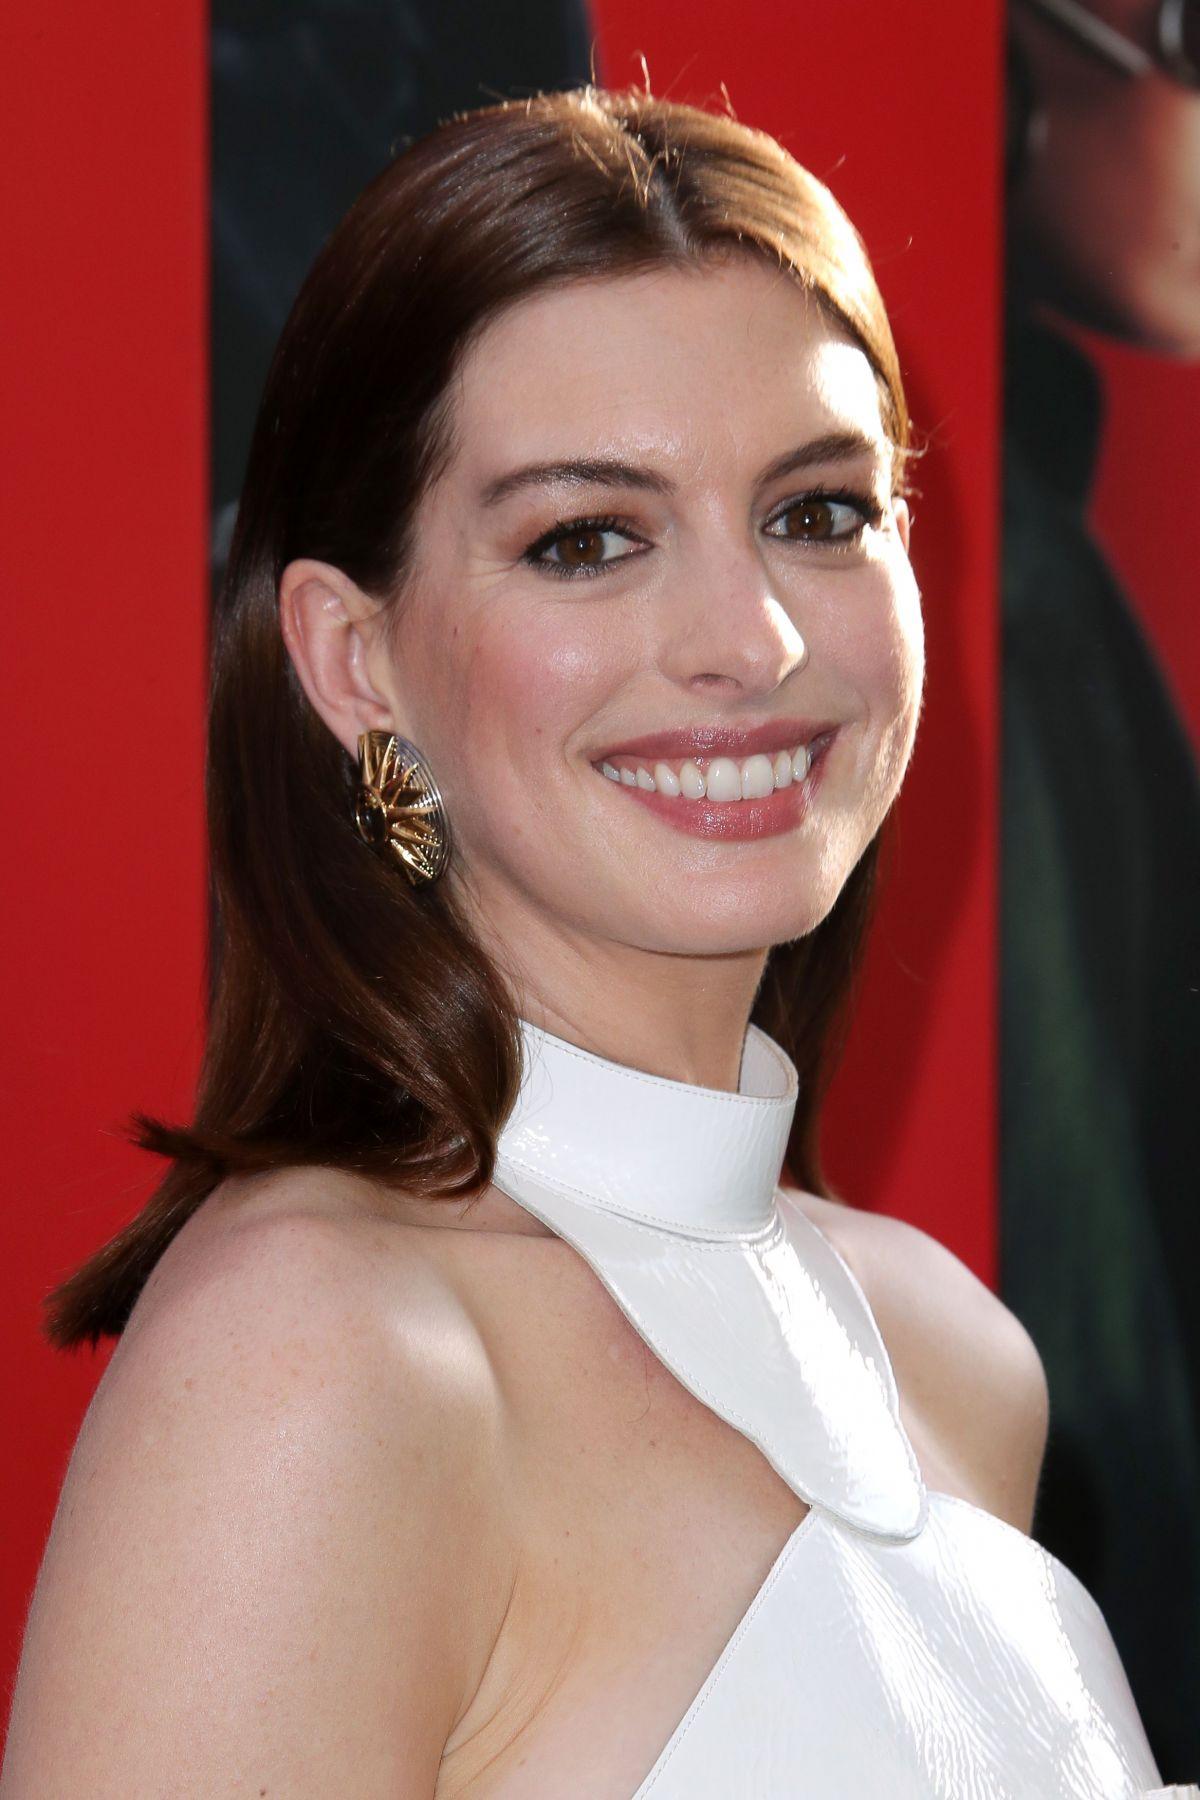 Anne Hathaway - HawtCelebs Anne Hathaway